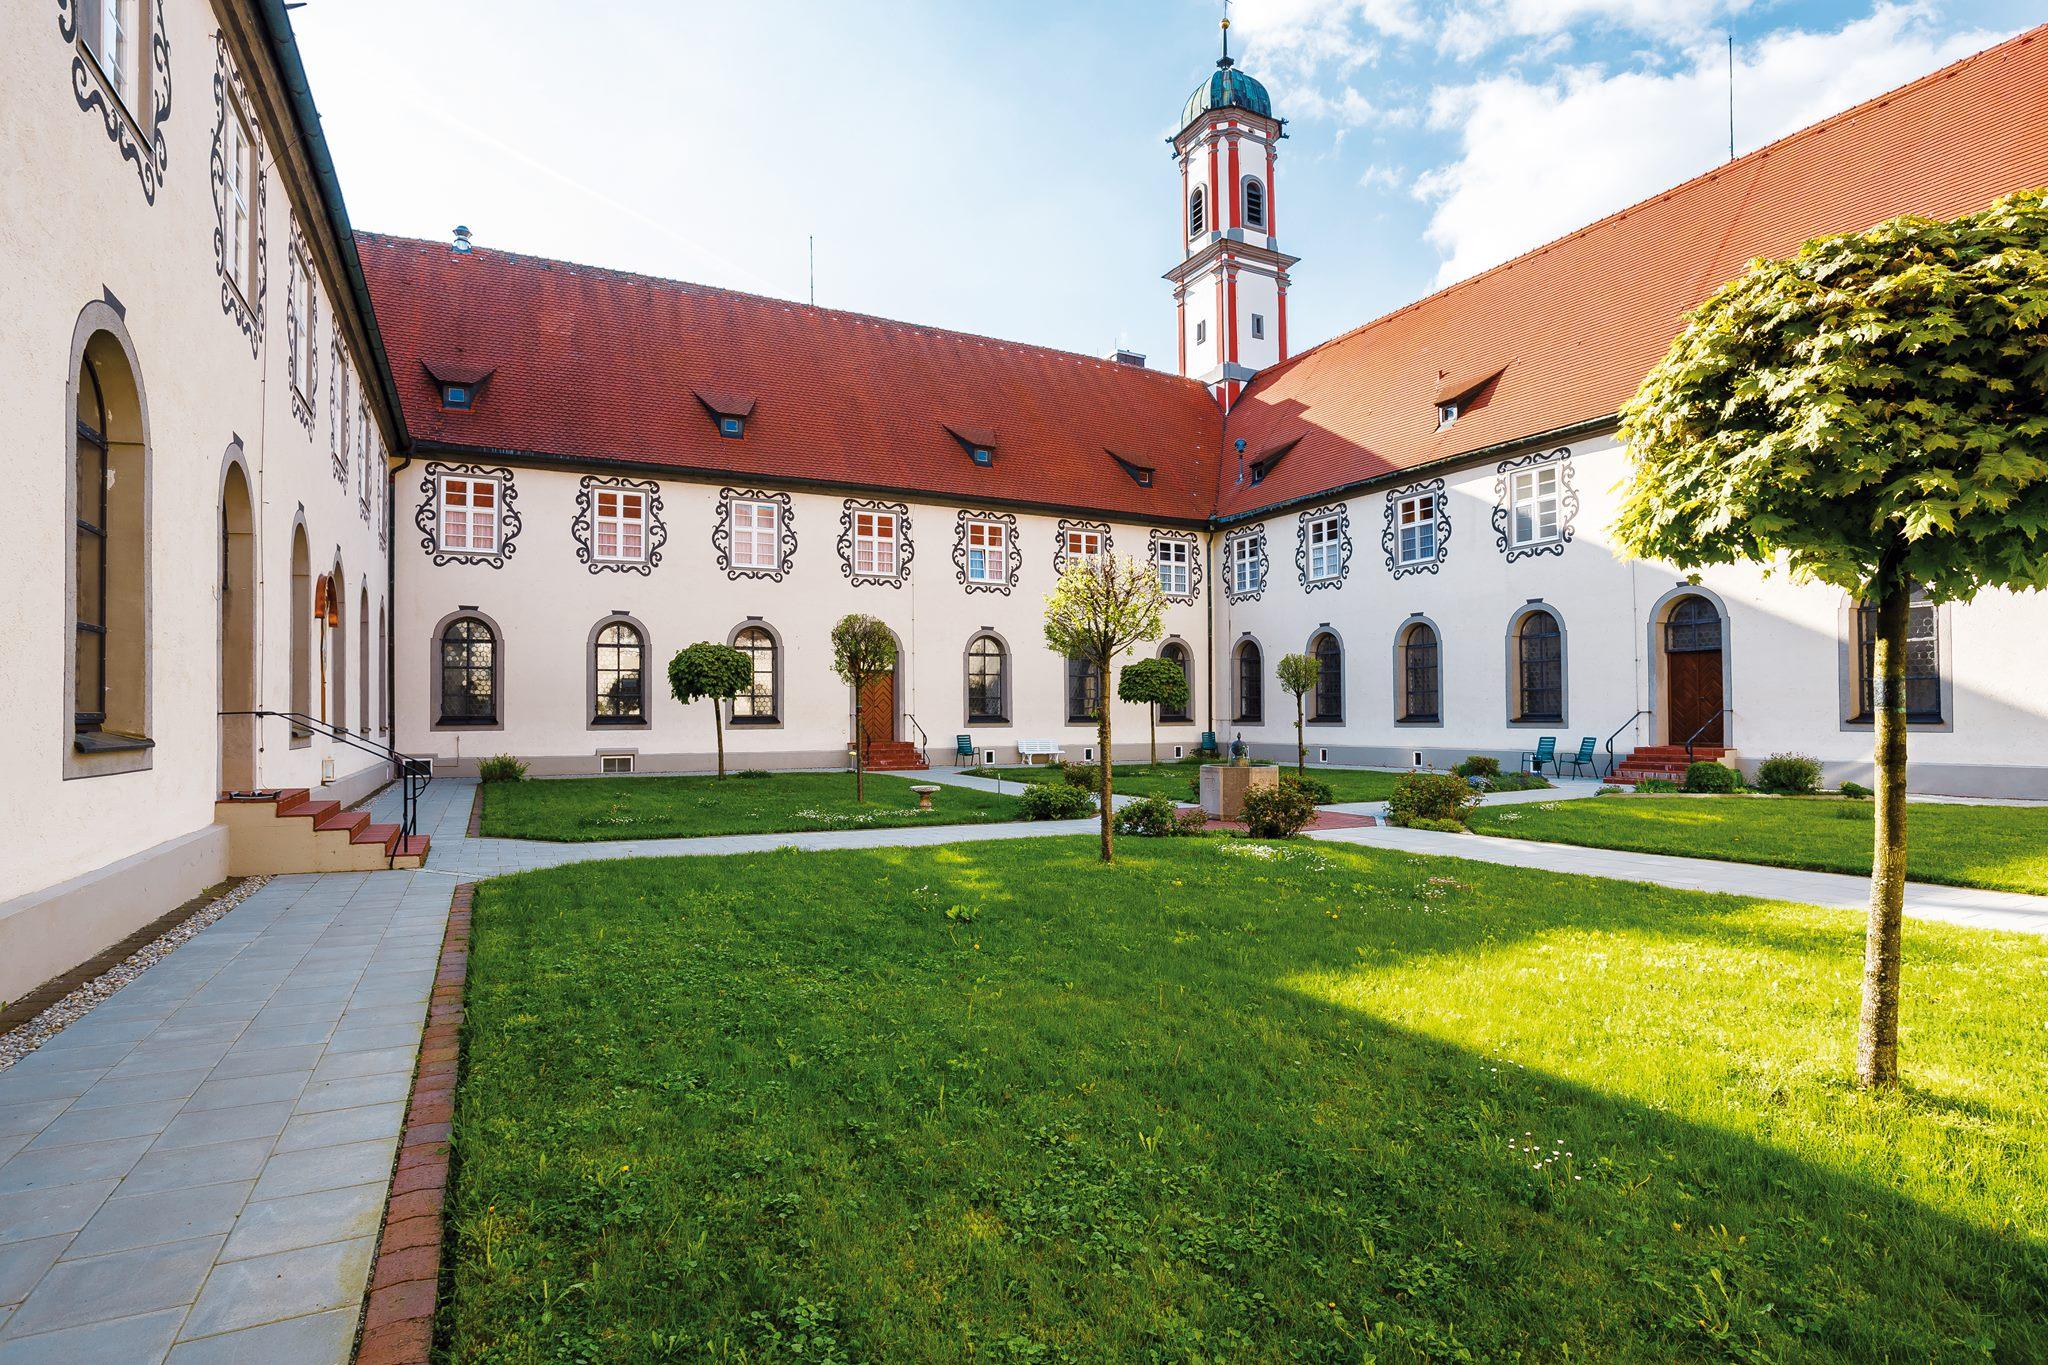 KurOase im Kloster / Bad Wörishofen - Planetbox